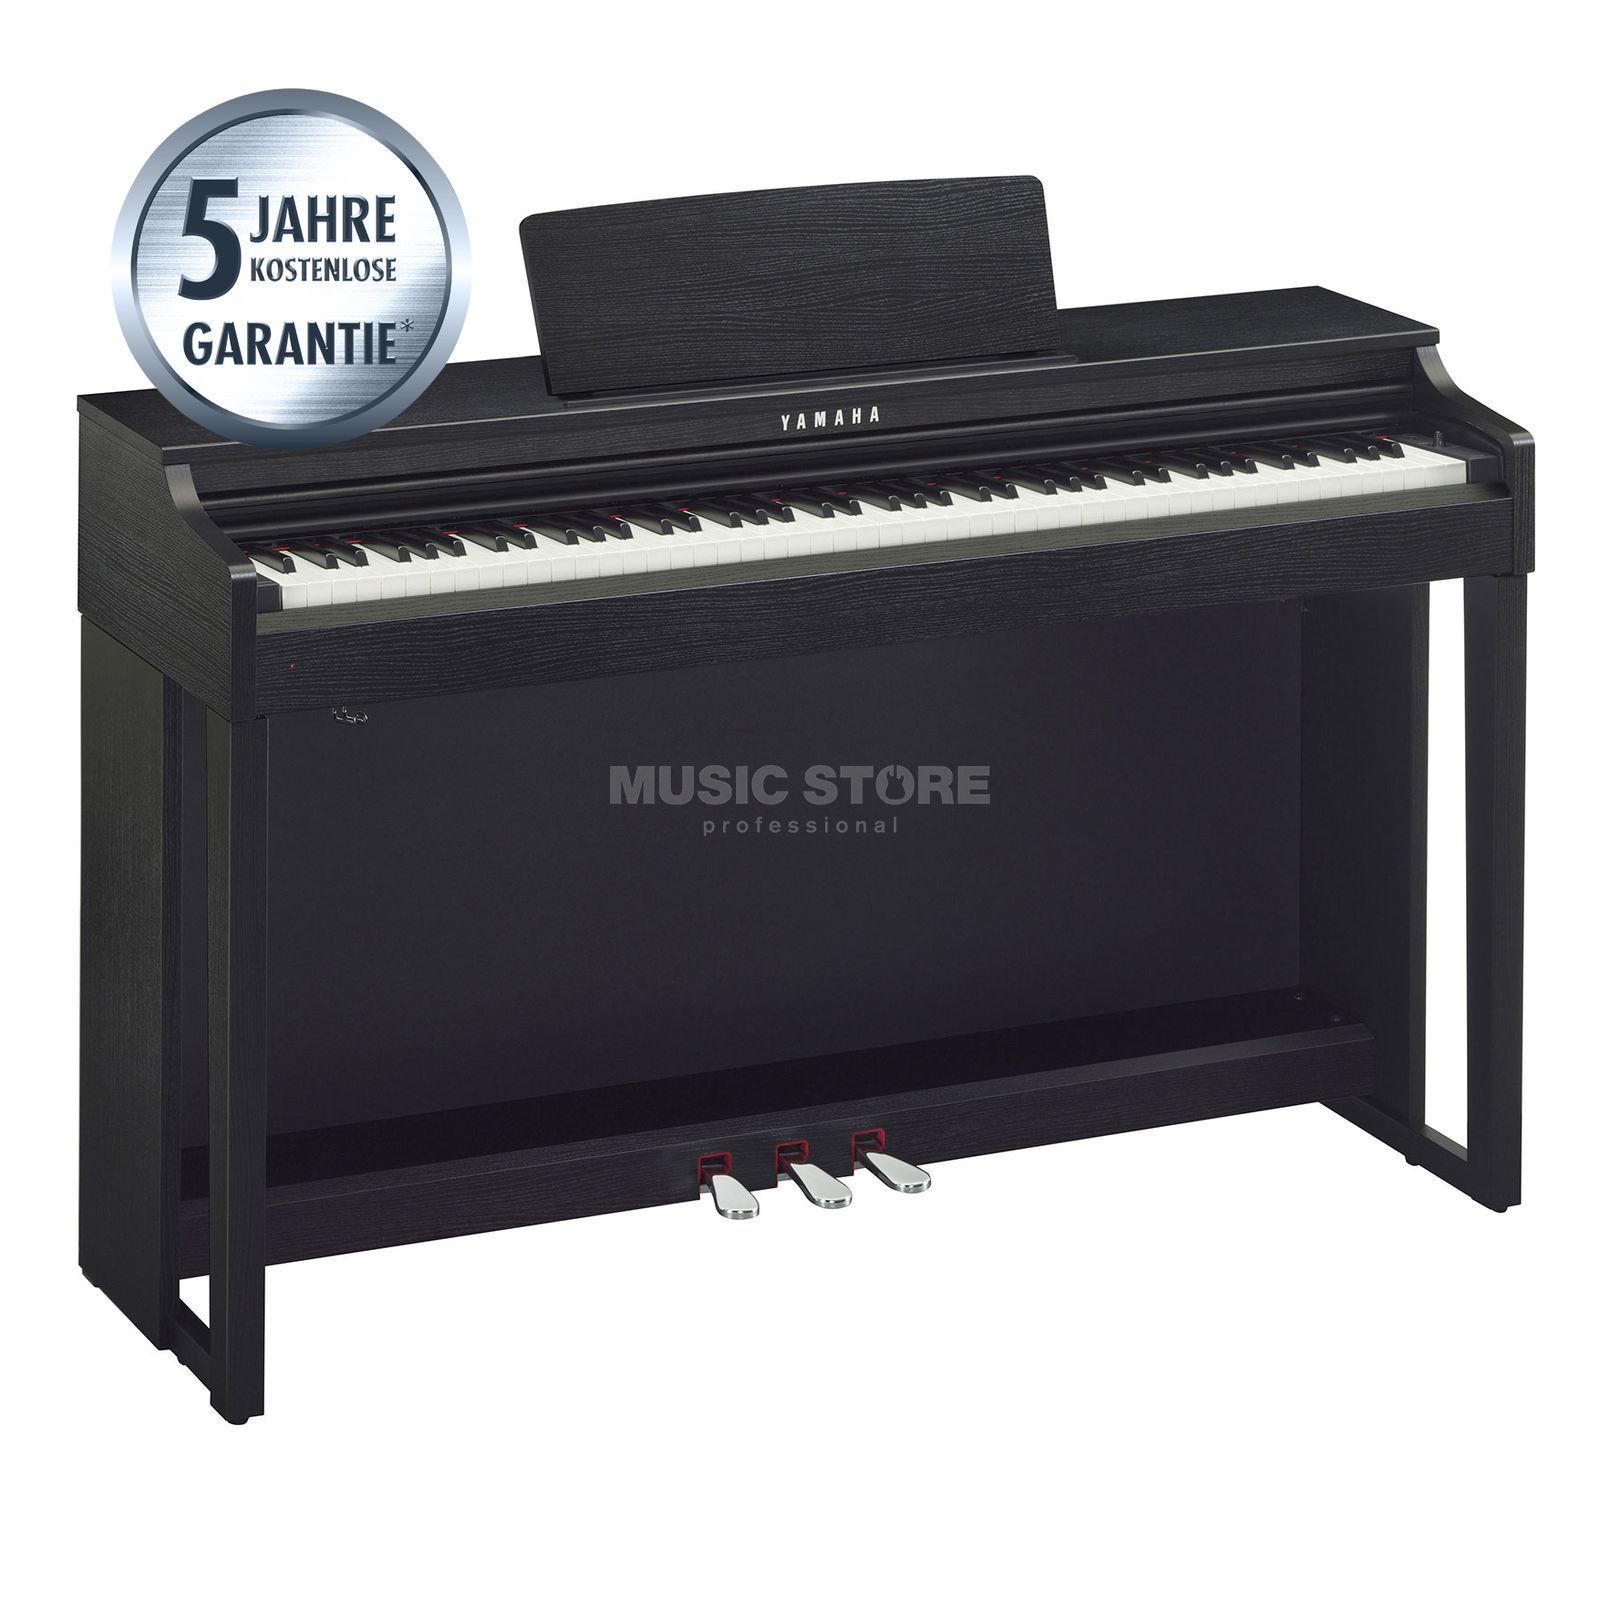 yamaha clavinova clp 525 b digital piano black. Black Bedroom Furniture Sets. Home Design Ideas